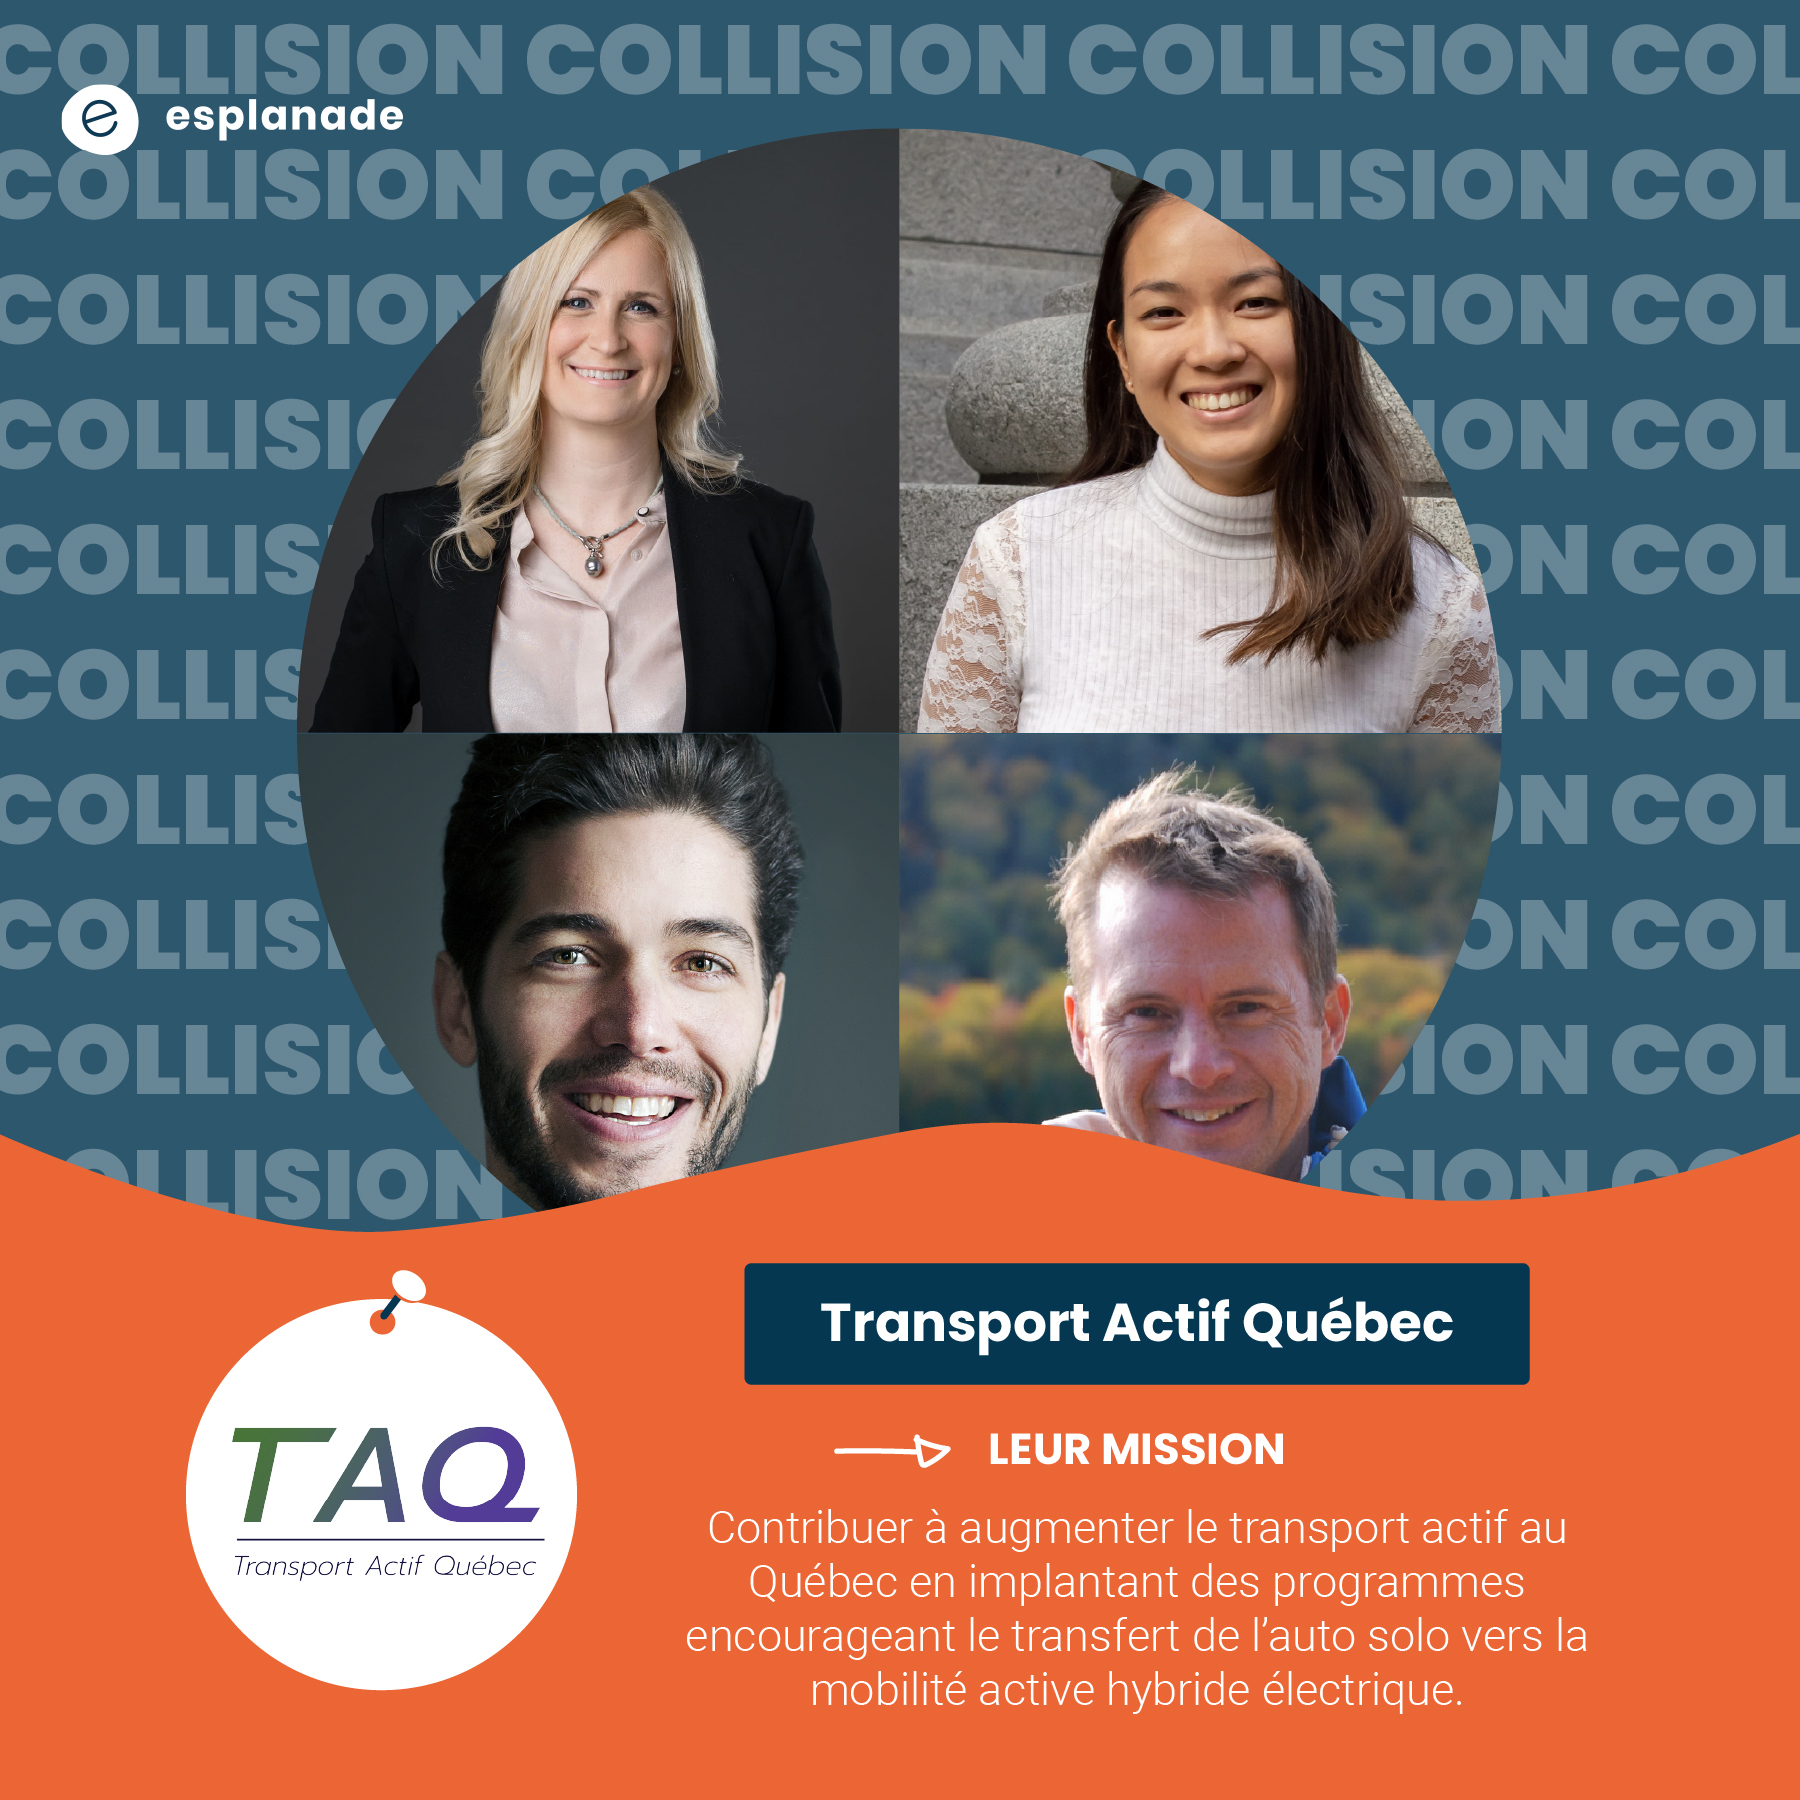 Stéphane Peevers, Belynda Francoeur, Charles Leclerc et Melody Tim Yen, de Transport Actif Québec